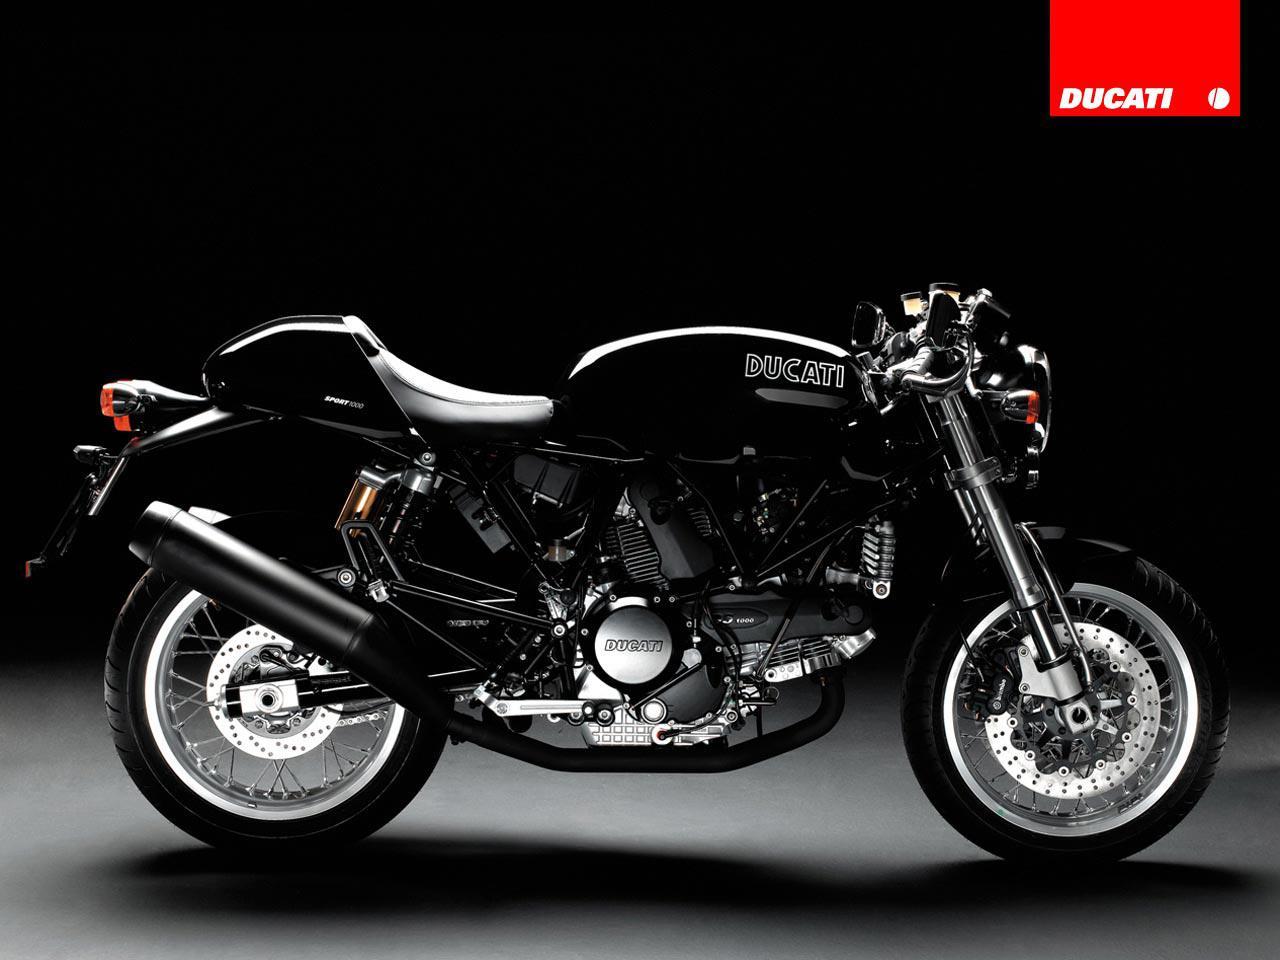 Ducati sport classic, Tron legacy and Ducati on Pinterest